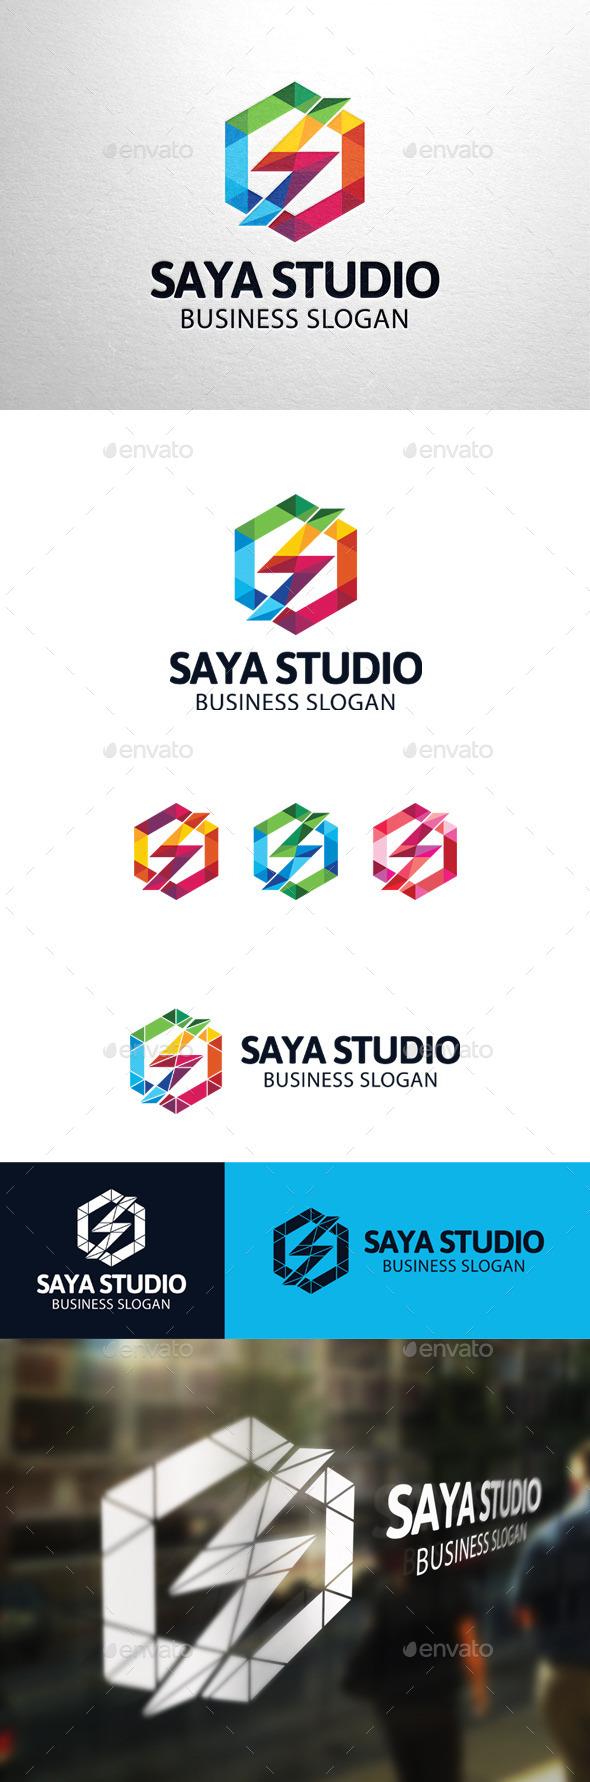 GraphicRiver Saya Studio Letter S Logo 11274900